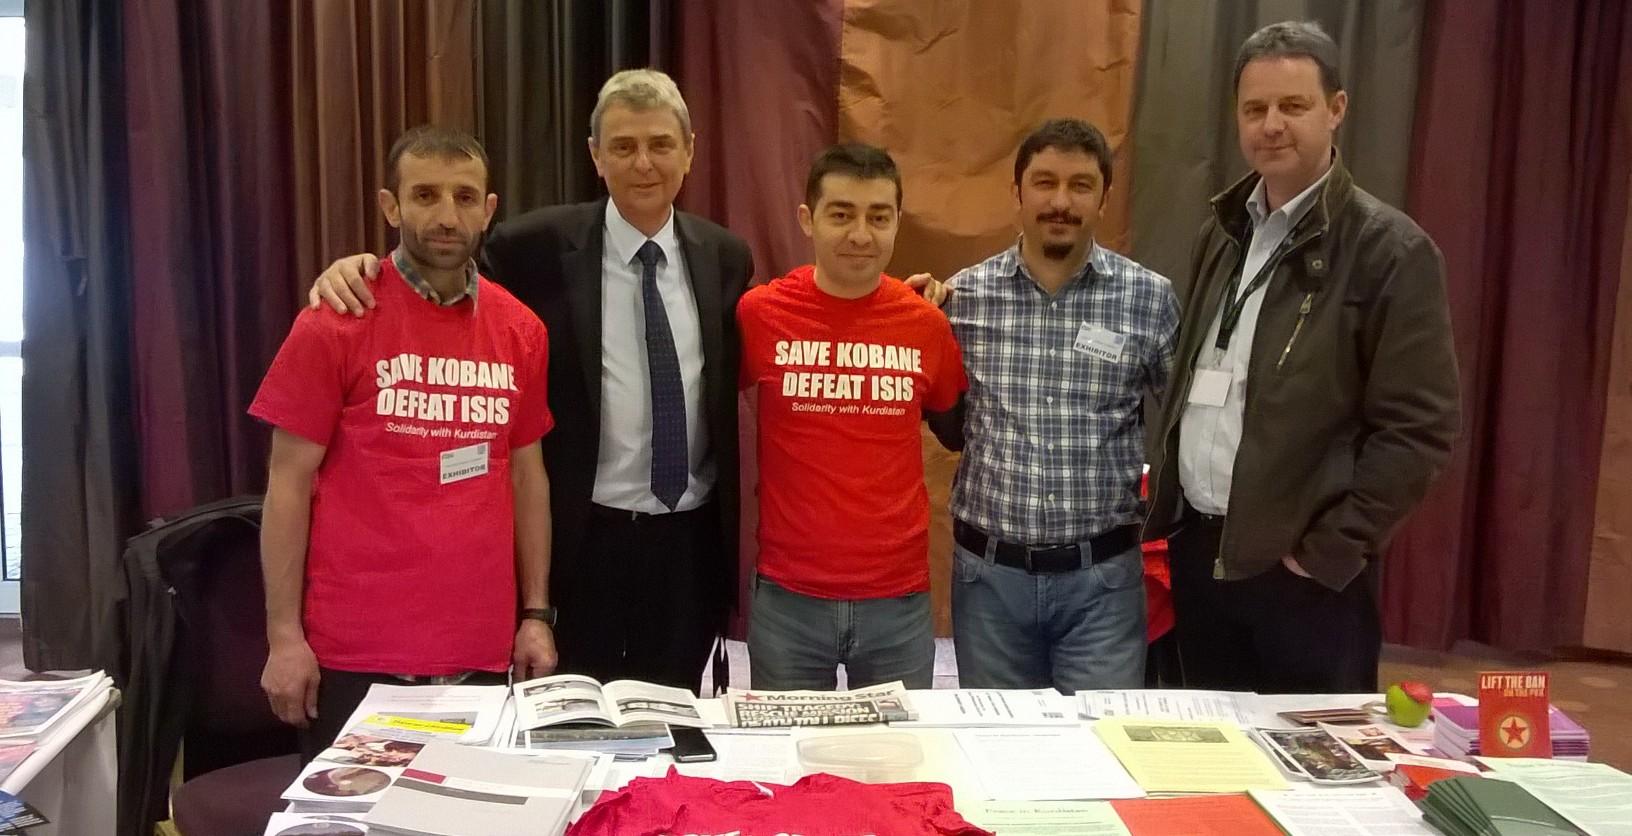 Kurdish activists with Stephen Smellie and UNISON general secretary Dave Parentis